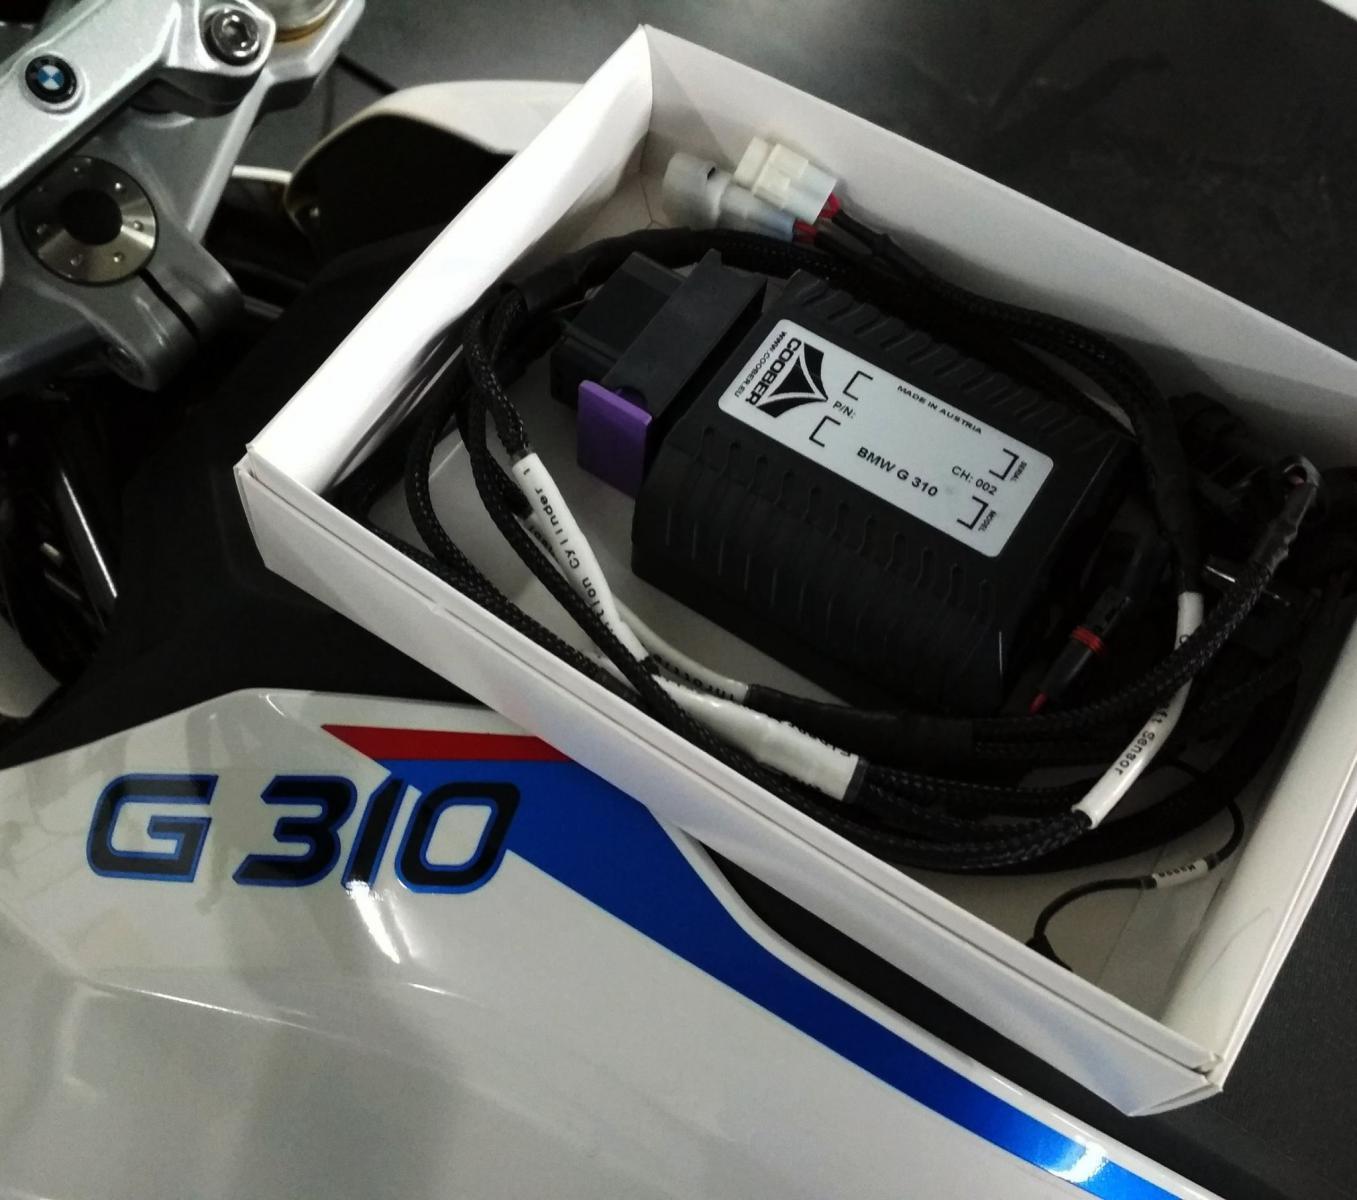 ECU for G310 - BMW G310 R/GS Forum